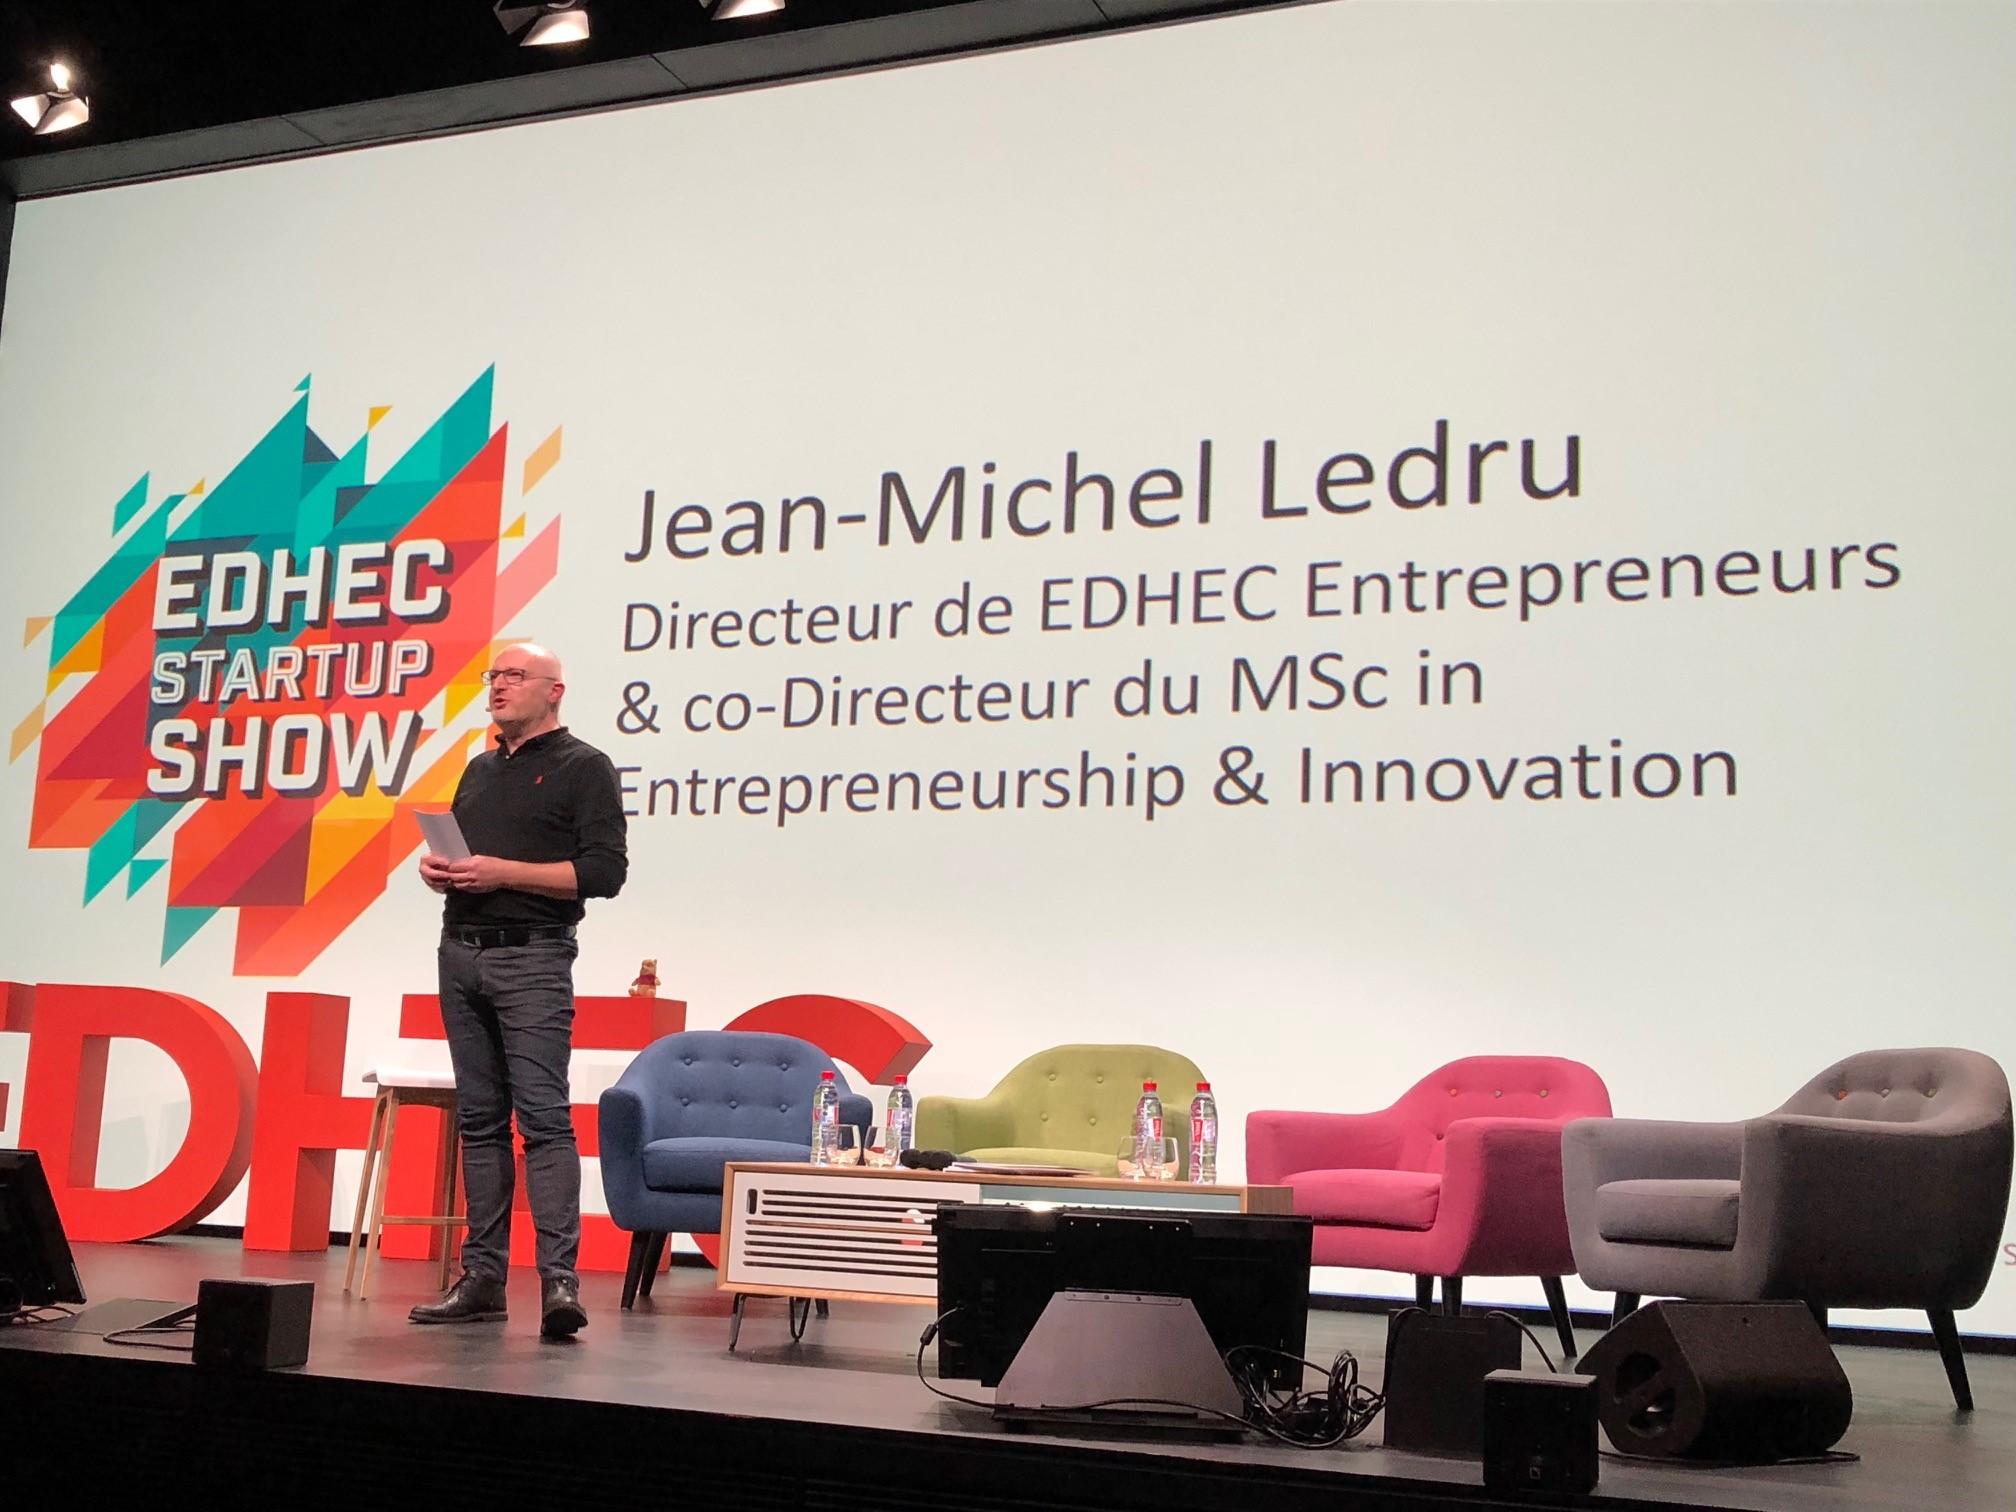 Jean-Michel Ledru EDHEC